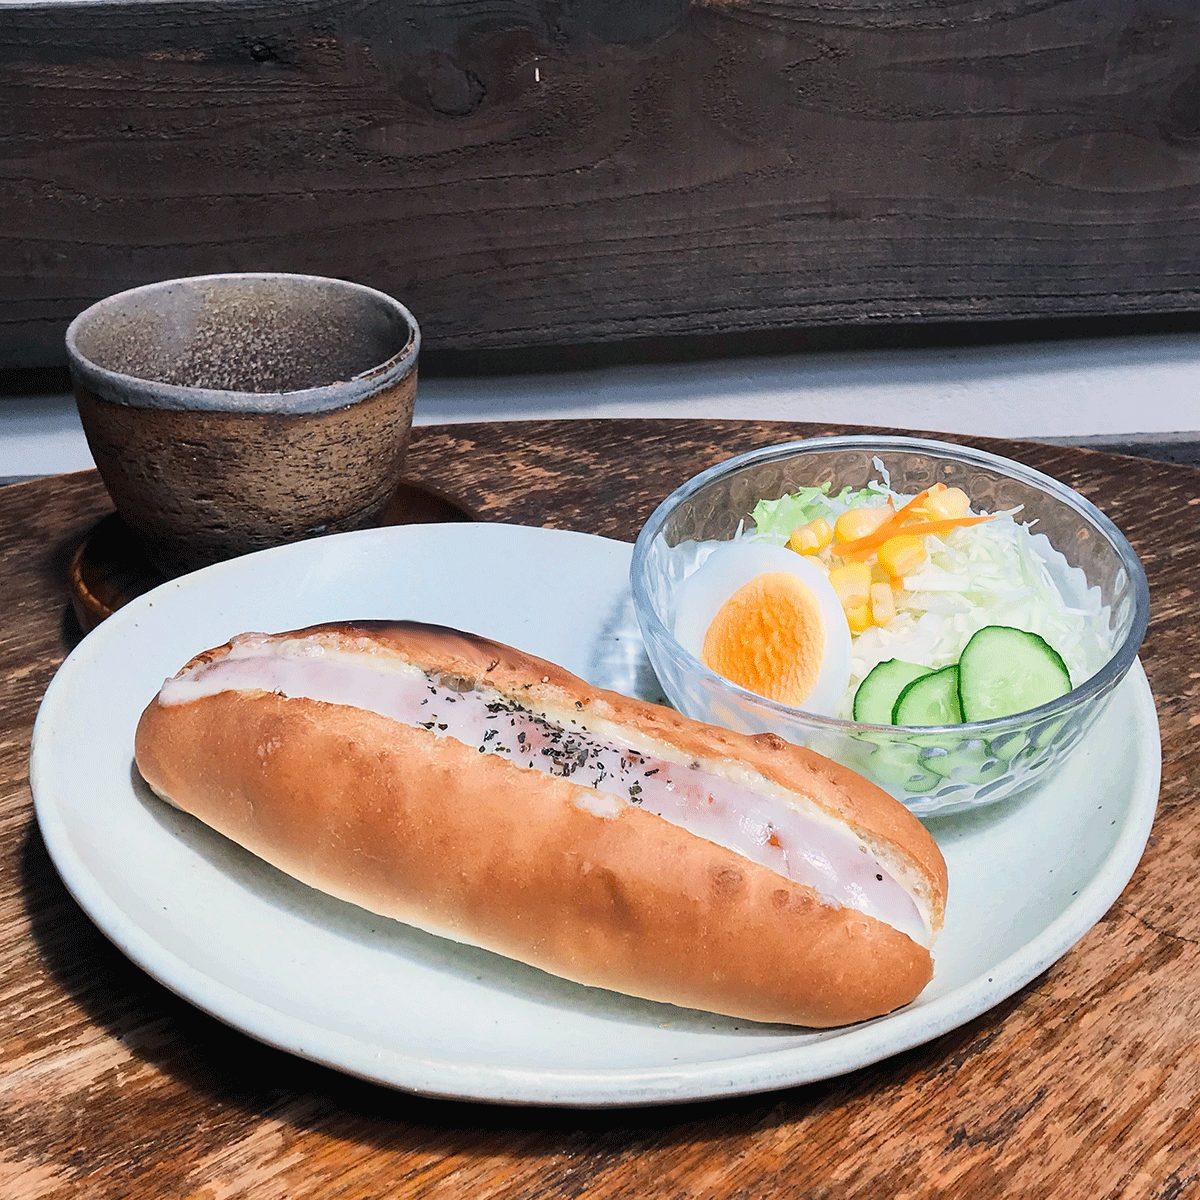 Usaboku's Lunche: Cheese Hotdog set